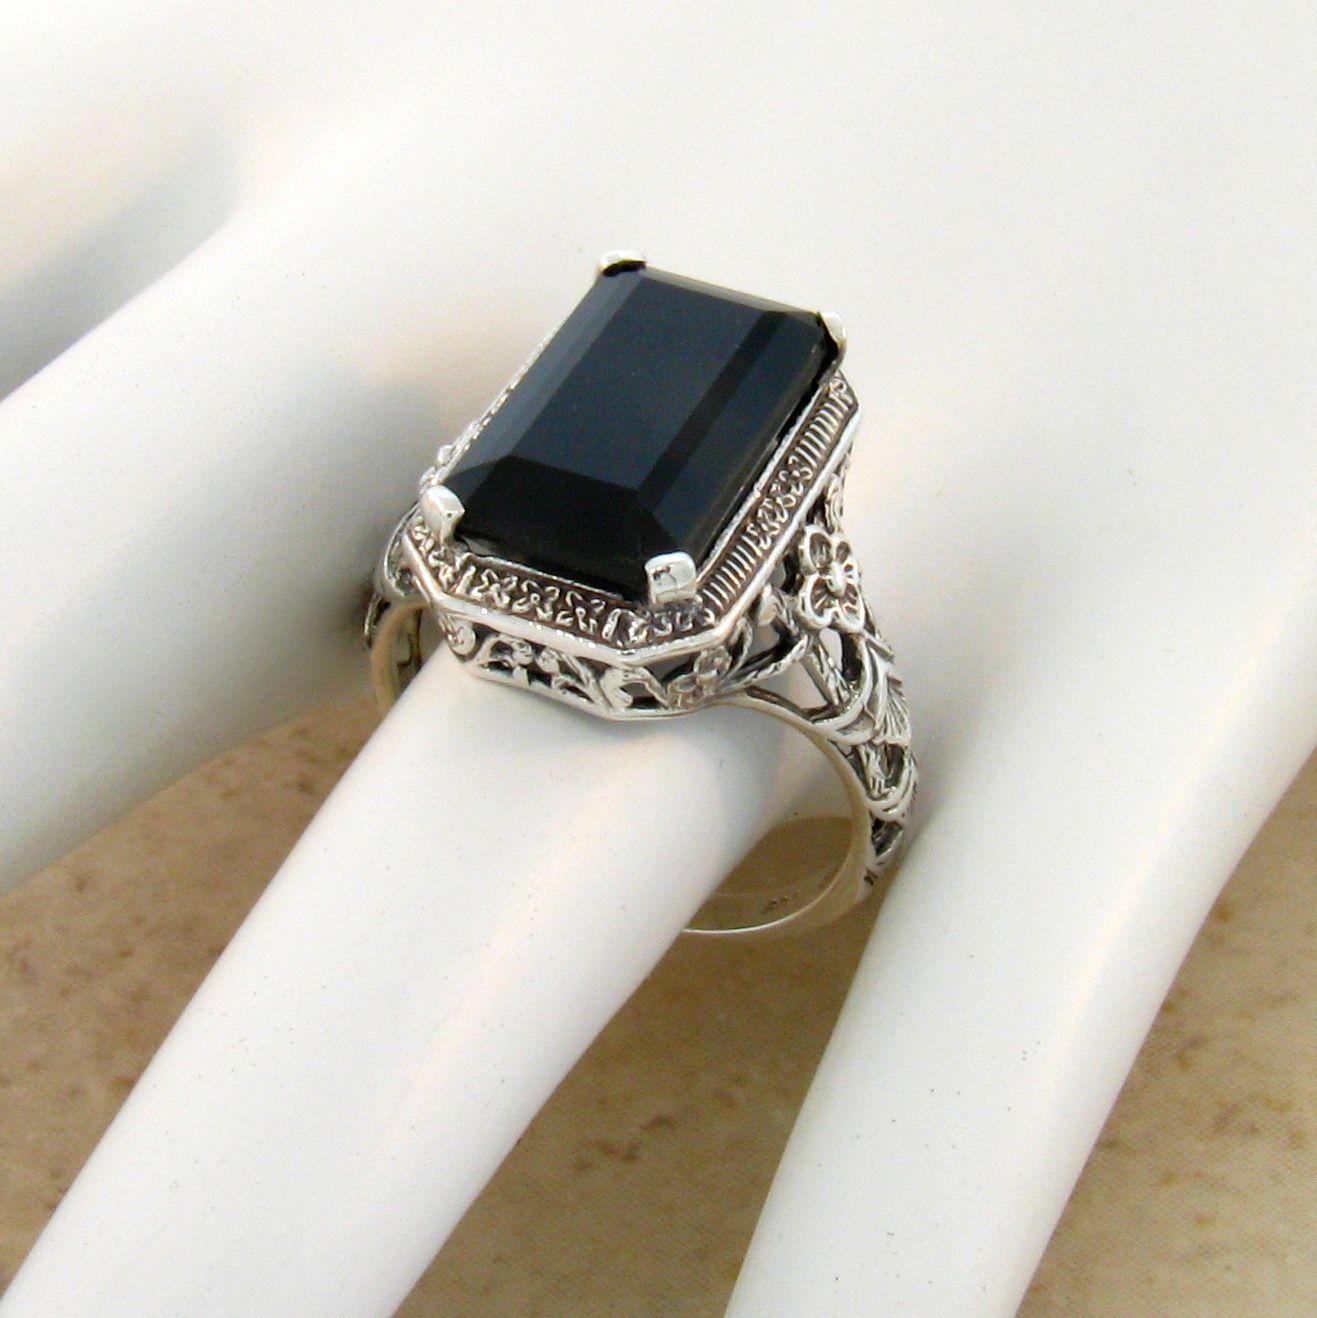 #584 GENUINE BLACK AGATE ANTIQUE DESIGN 925 STERLING SILVER RING SIZE 6